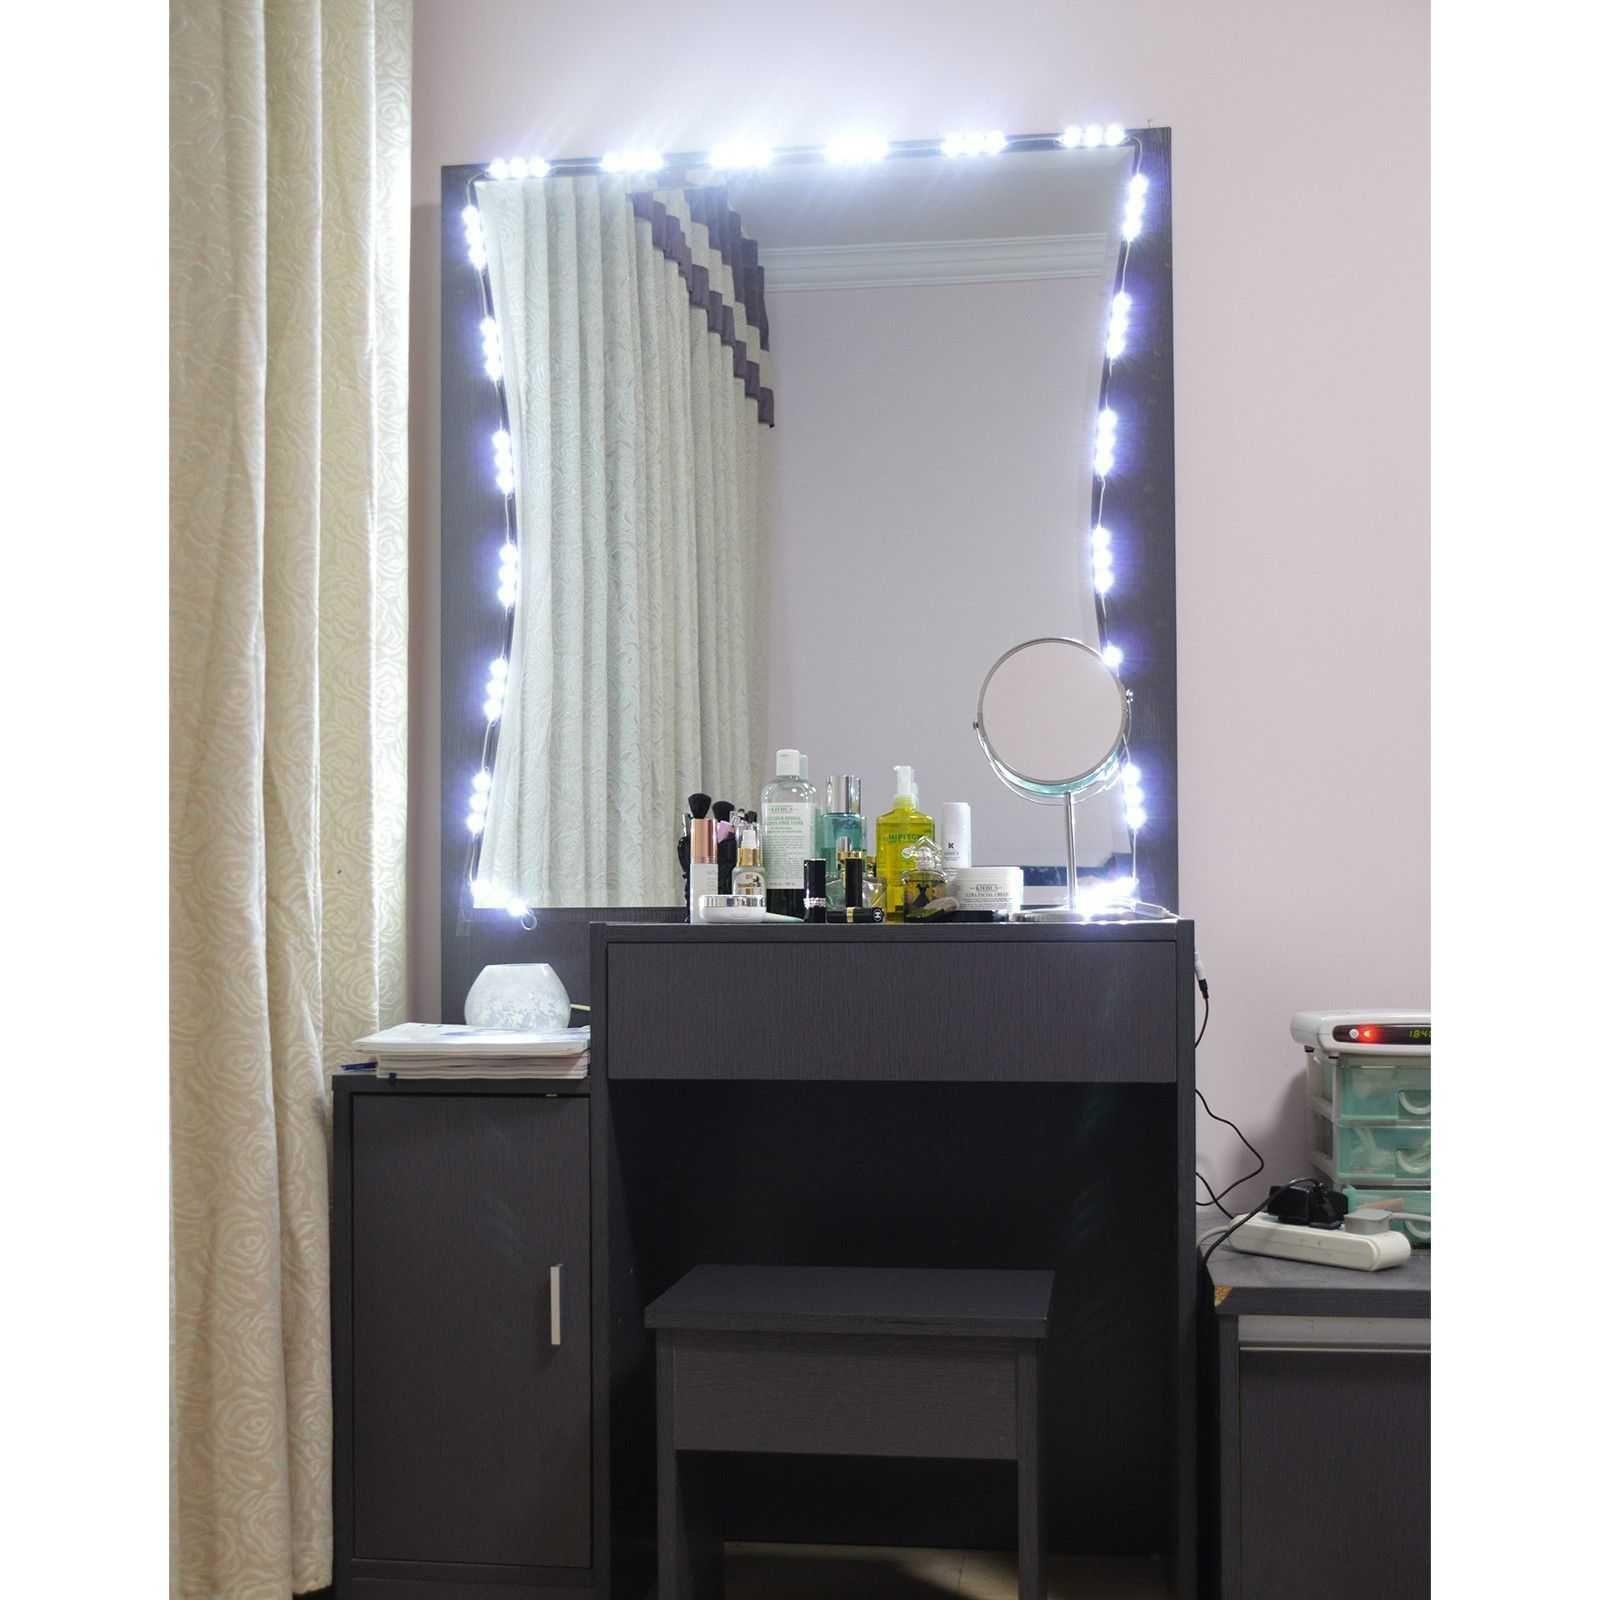 24 Luxury Vanity Mirror with Lights Ideas